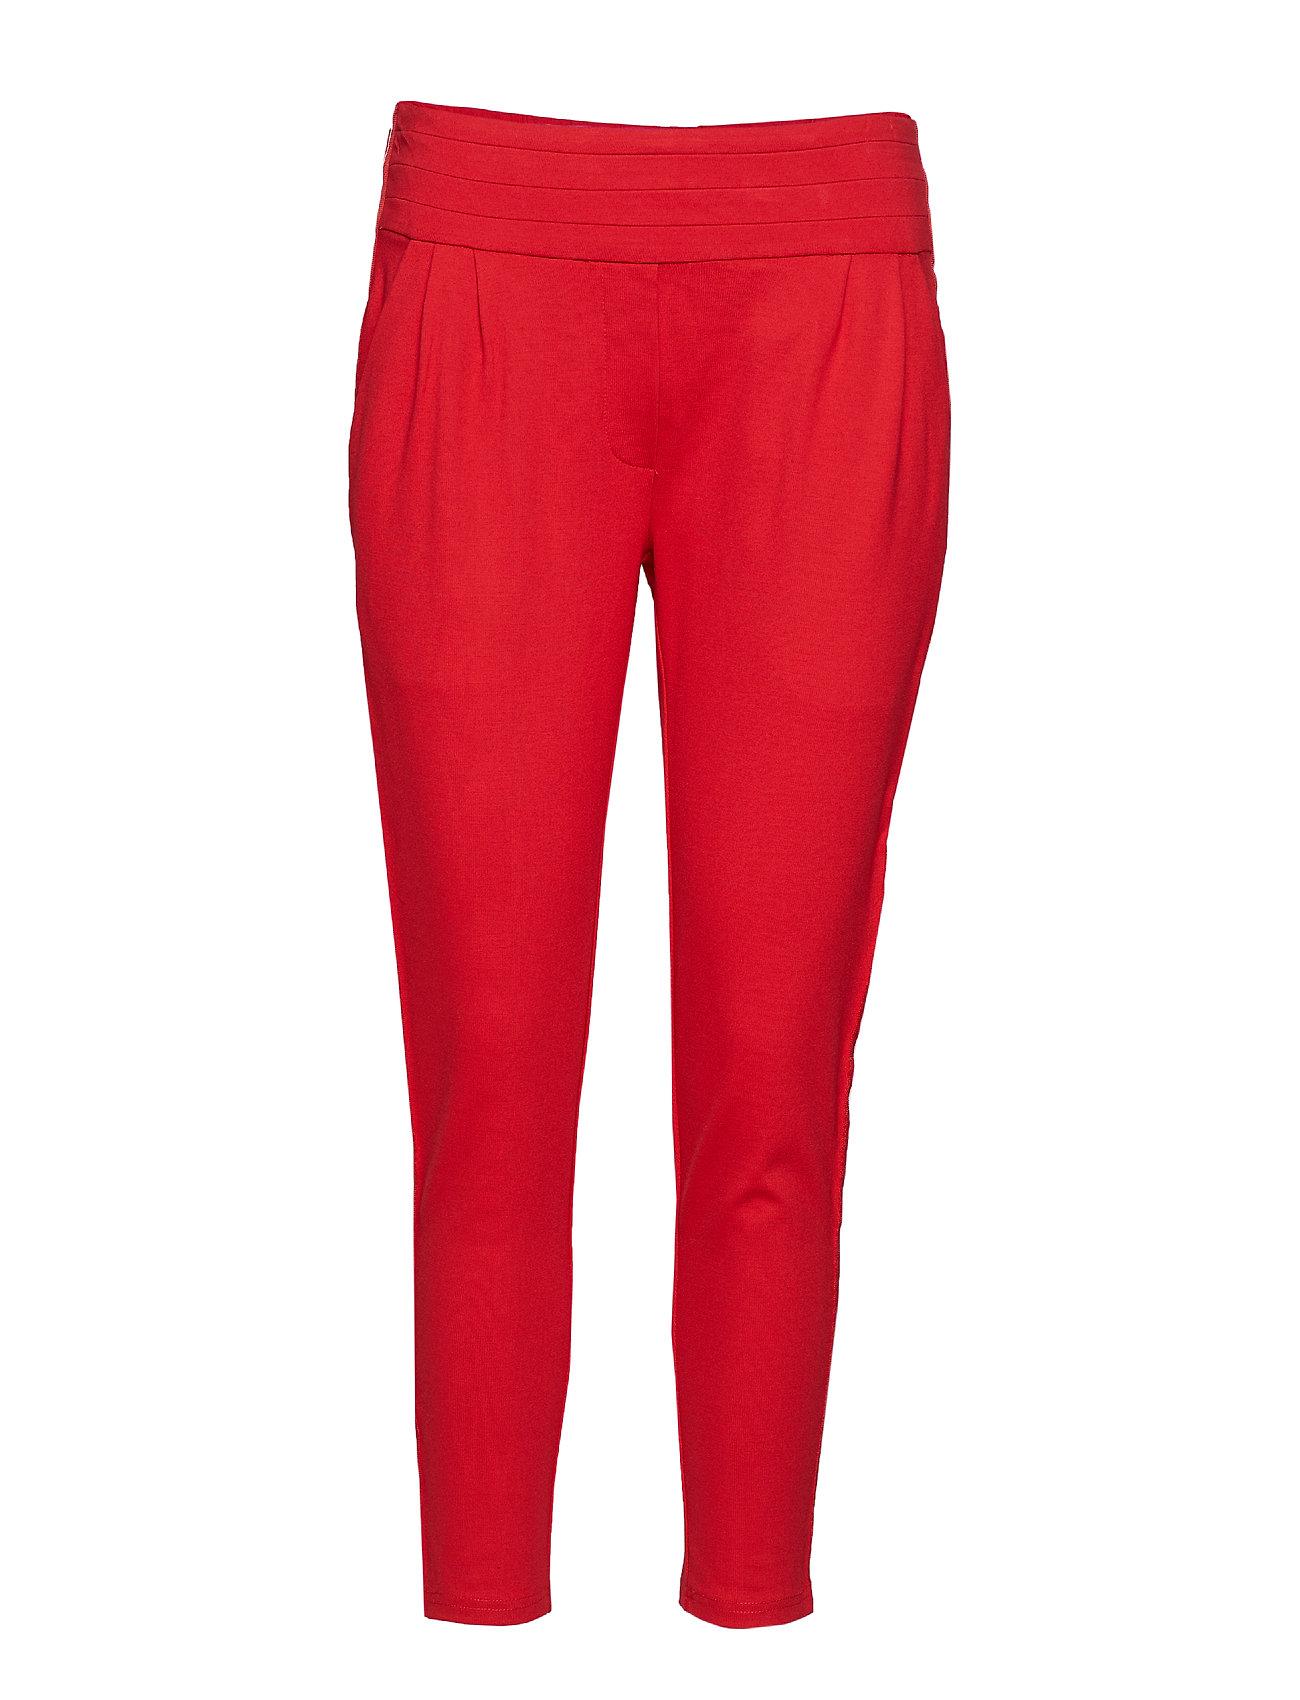 Soft Rebels Freya Stripe Pant 7/8 - 350 SPIZY RED